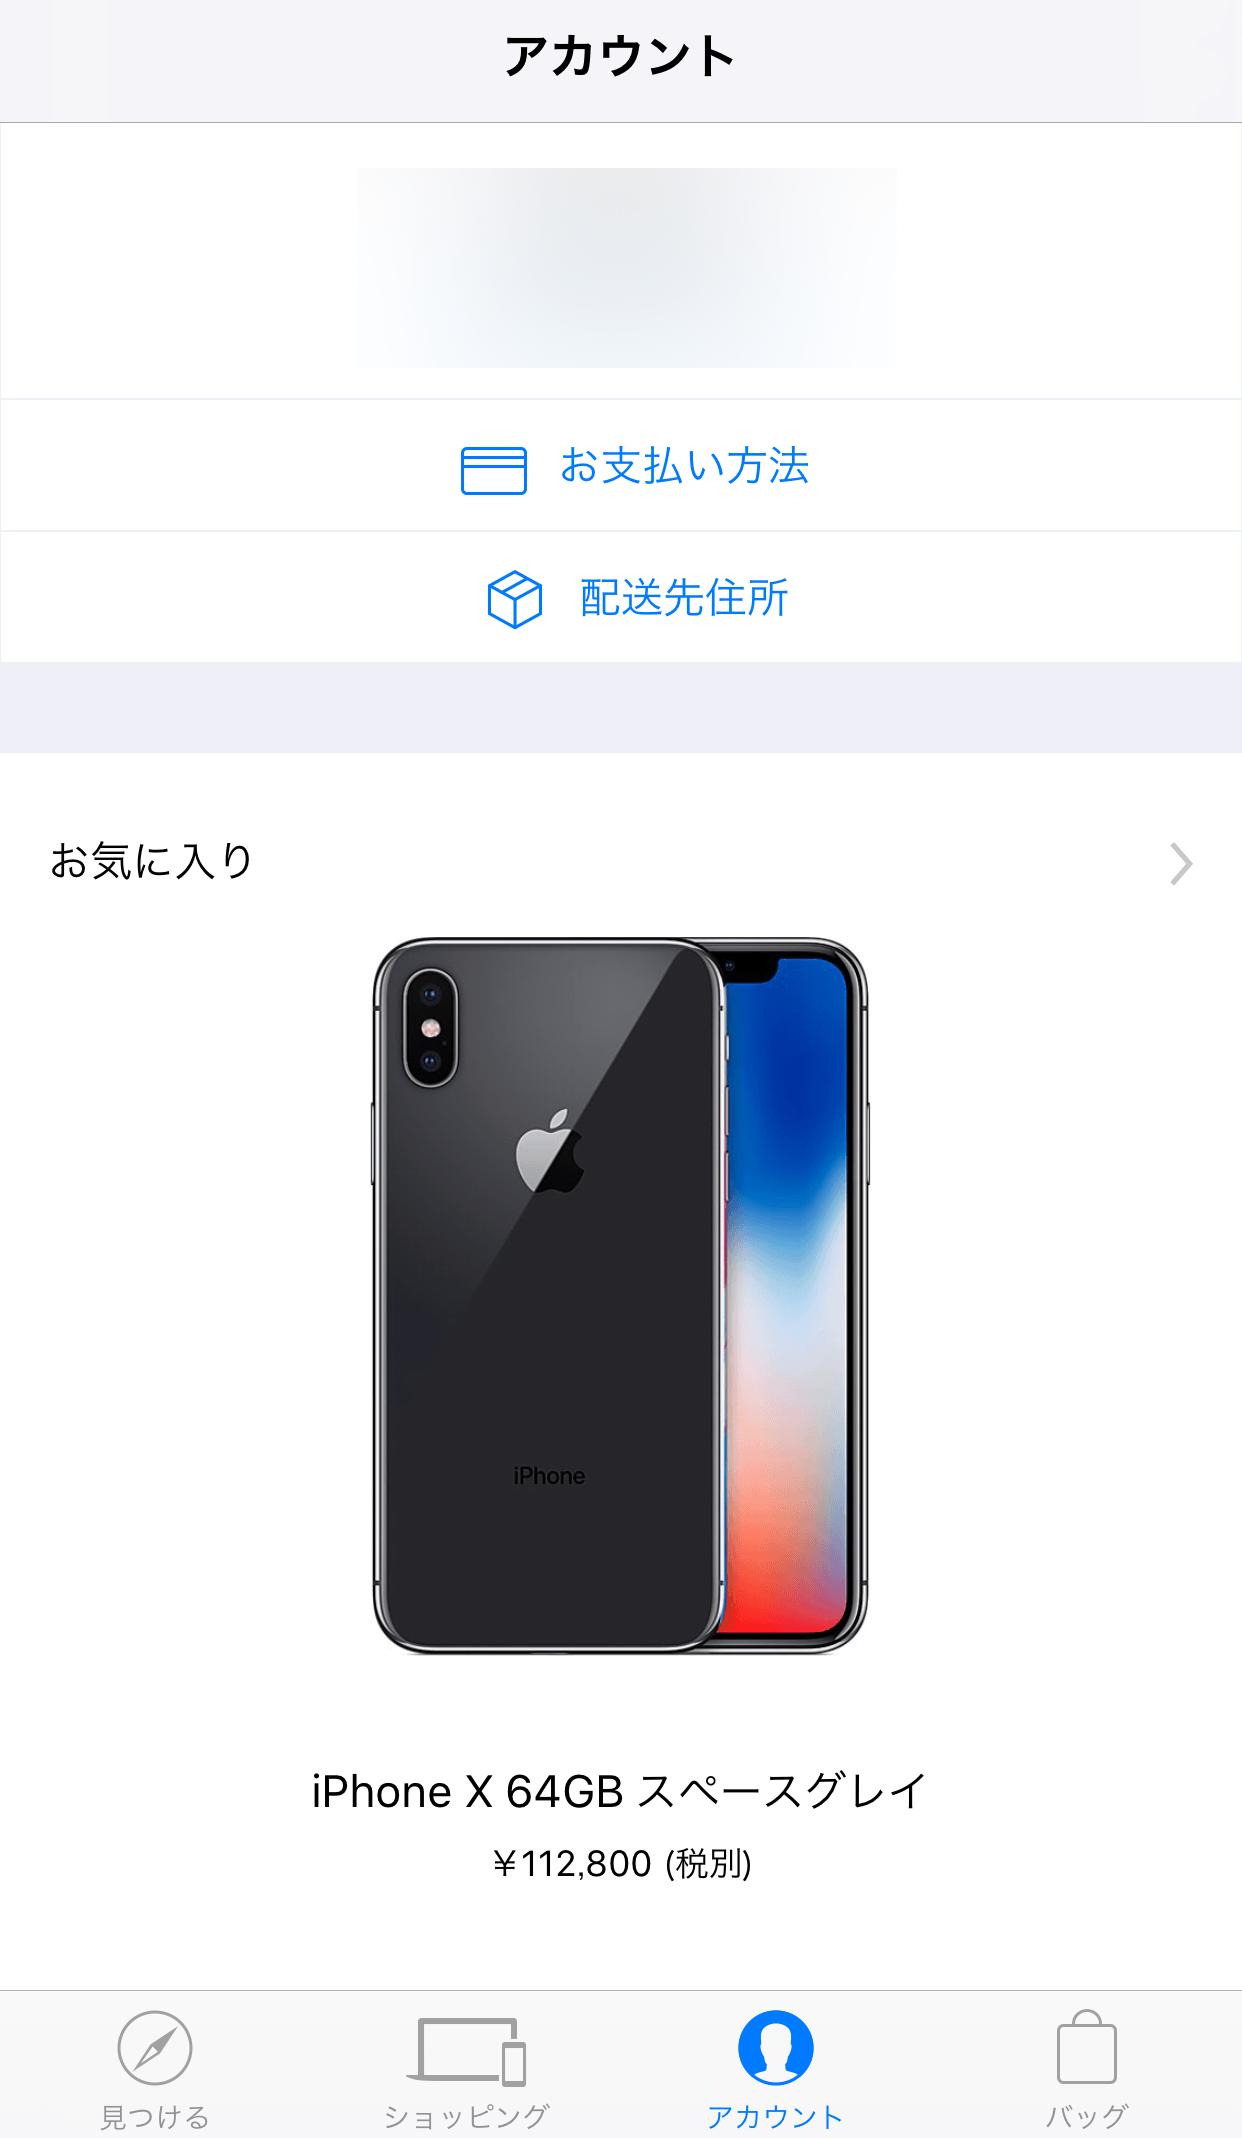 IPhoneX AppStoreYoyaku 08